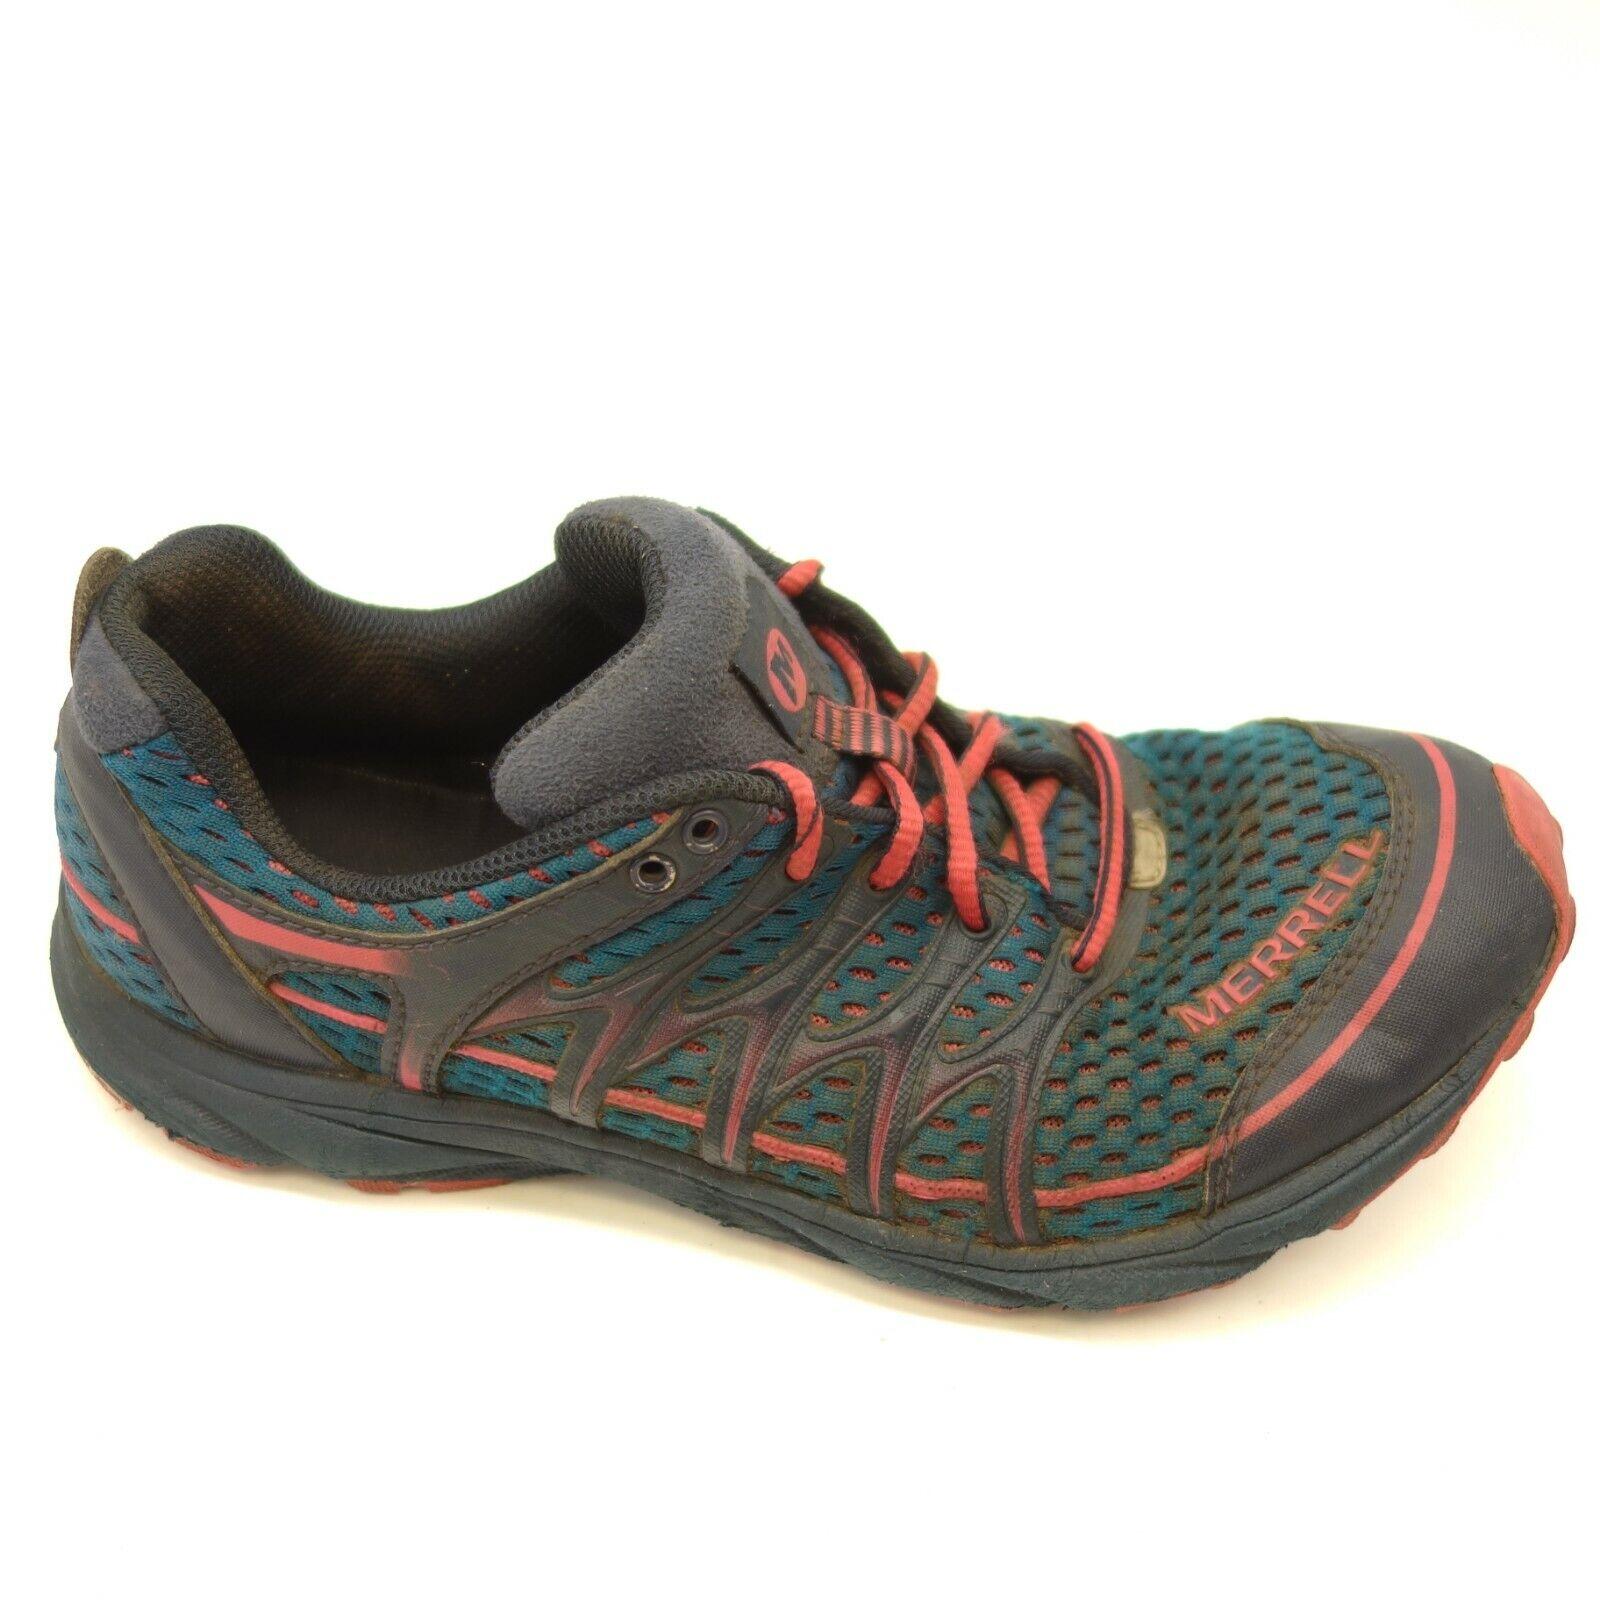 Merrell Mix Master Us 8 Eu 38.5 Deportivo Exterior Trail Running Zapatos Mujer